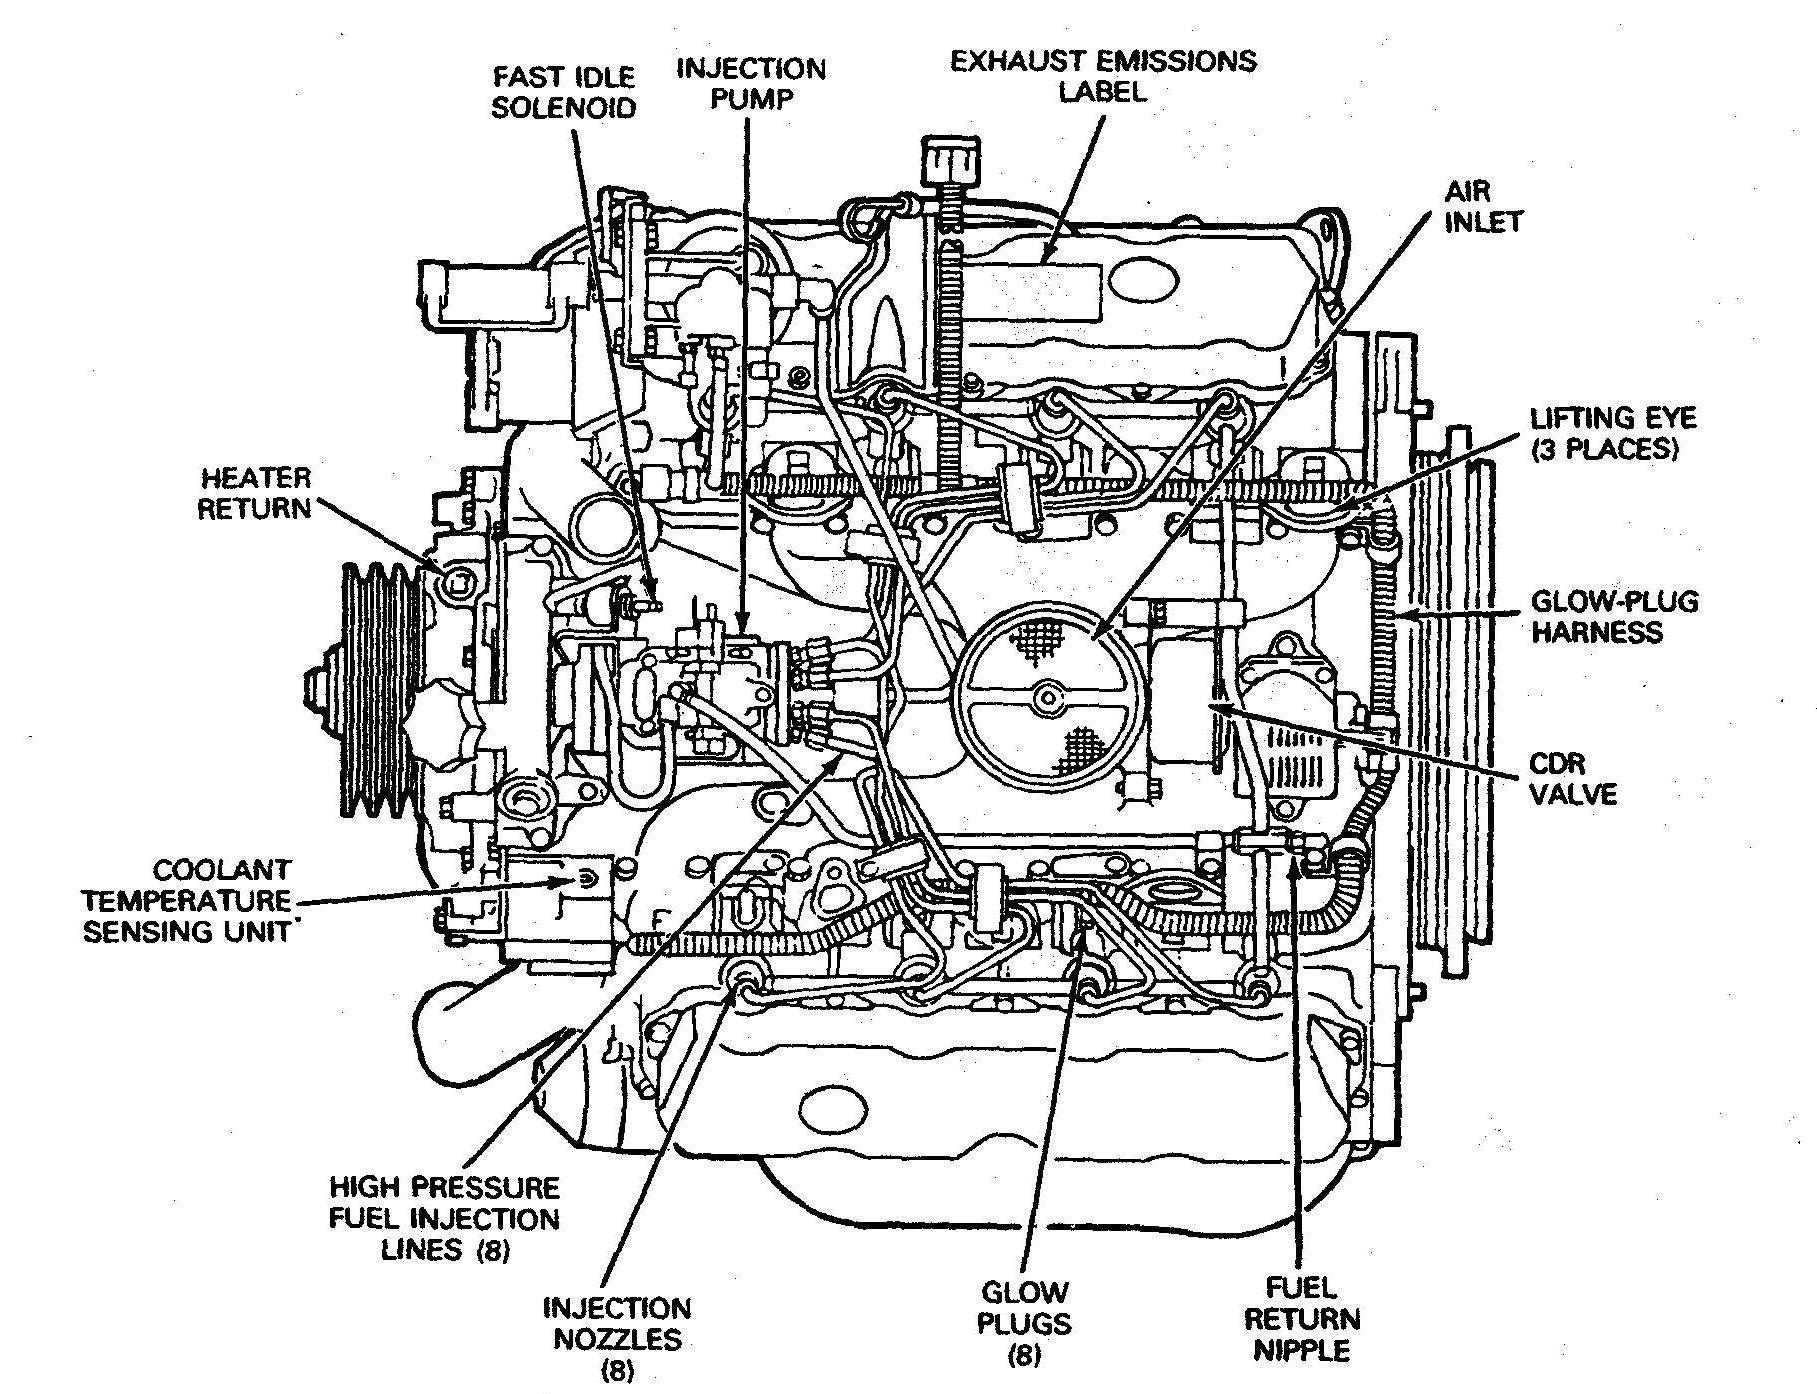 2006 Duramax Engine Diagram | Wiring Liry on